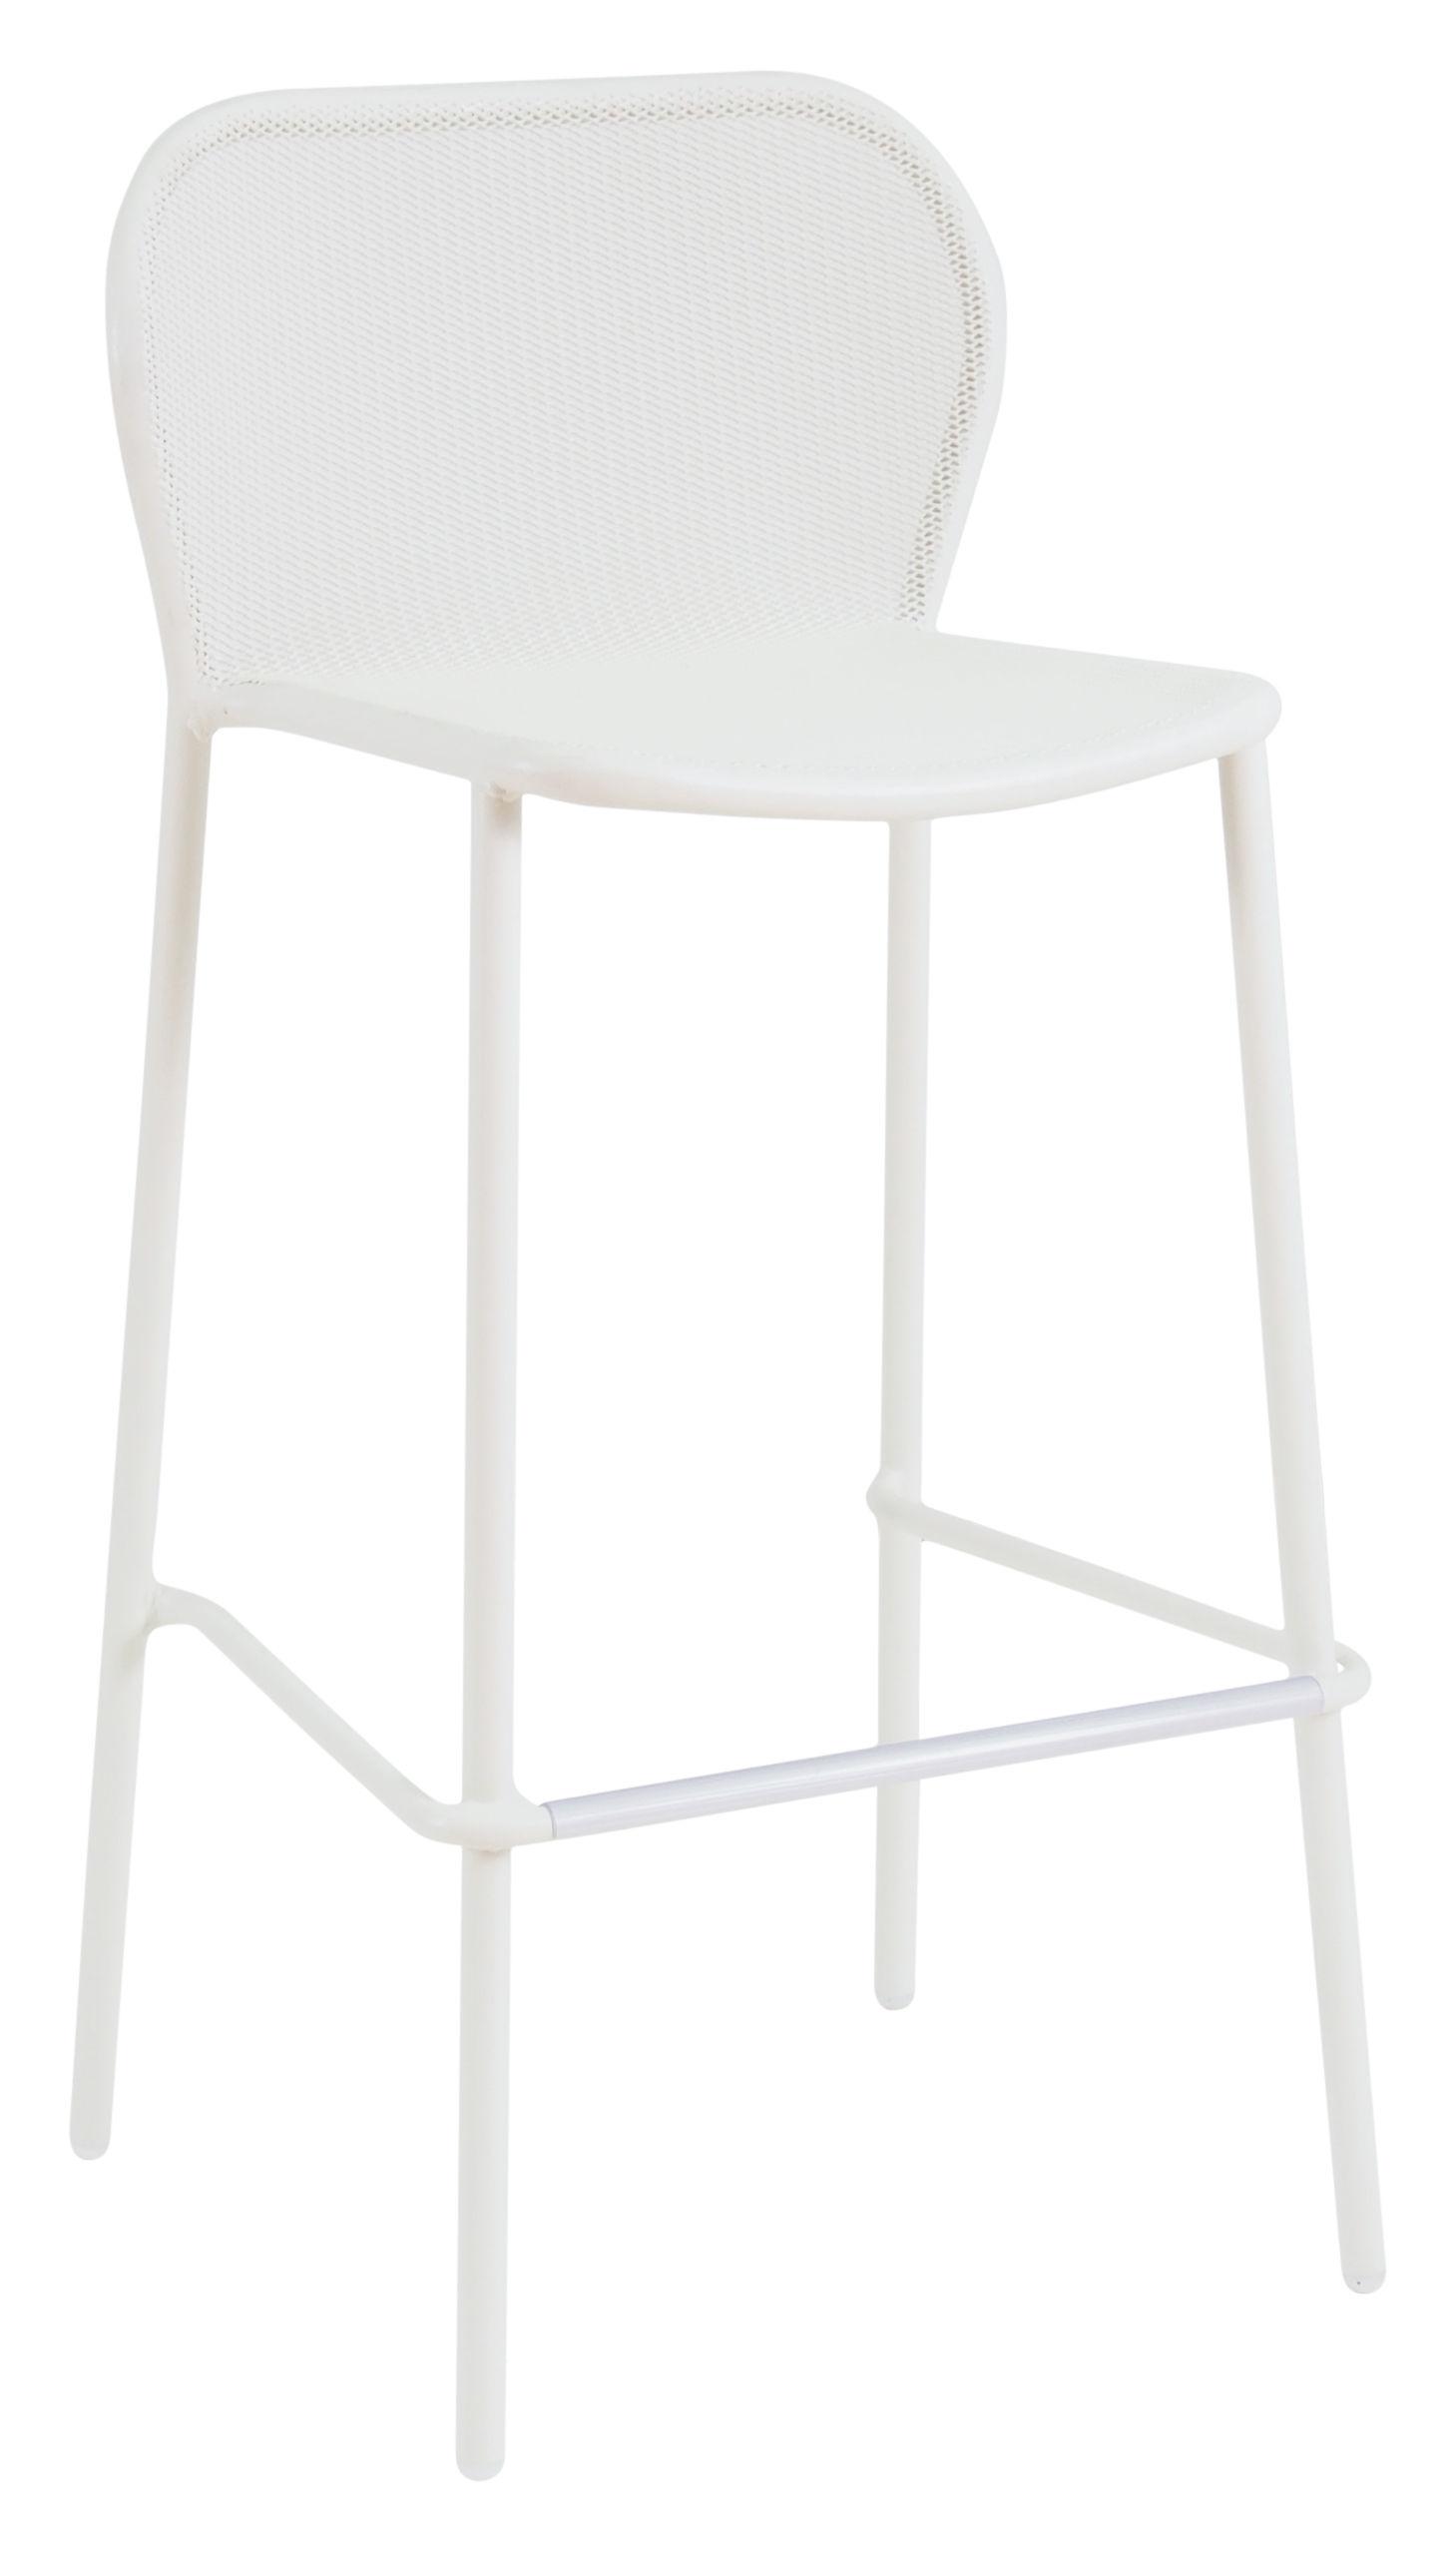 Furniture - Bar Stools - Darwin Bar chair - H 75 cm - Metal by Emu - White - Varnished steel